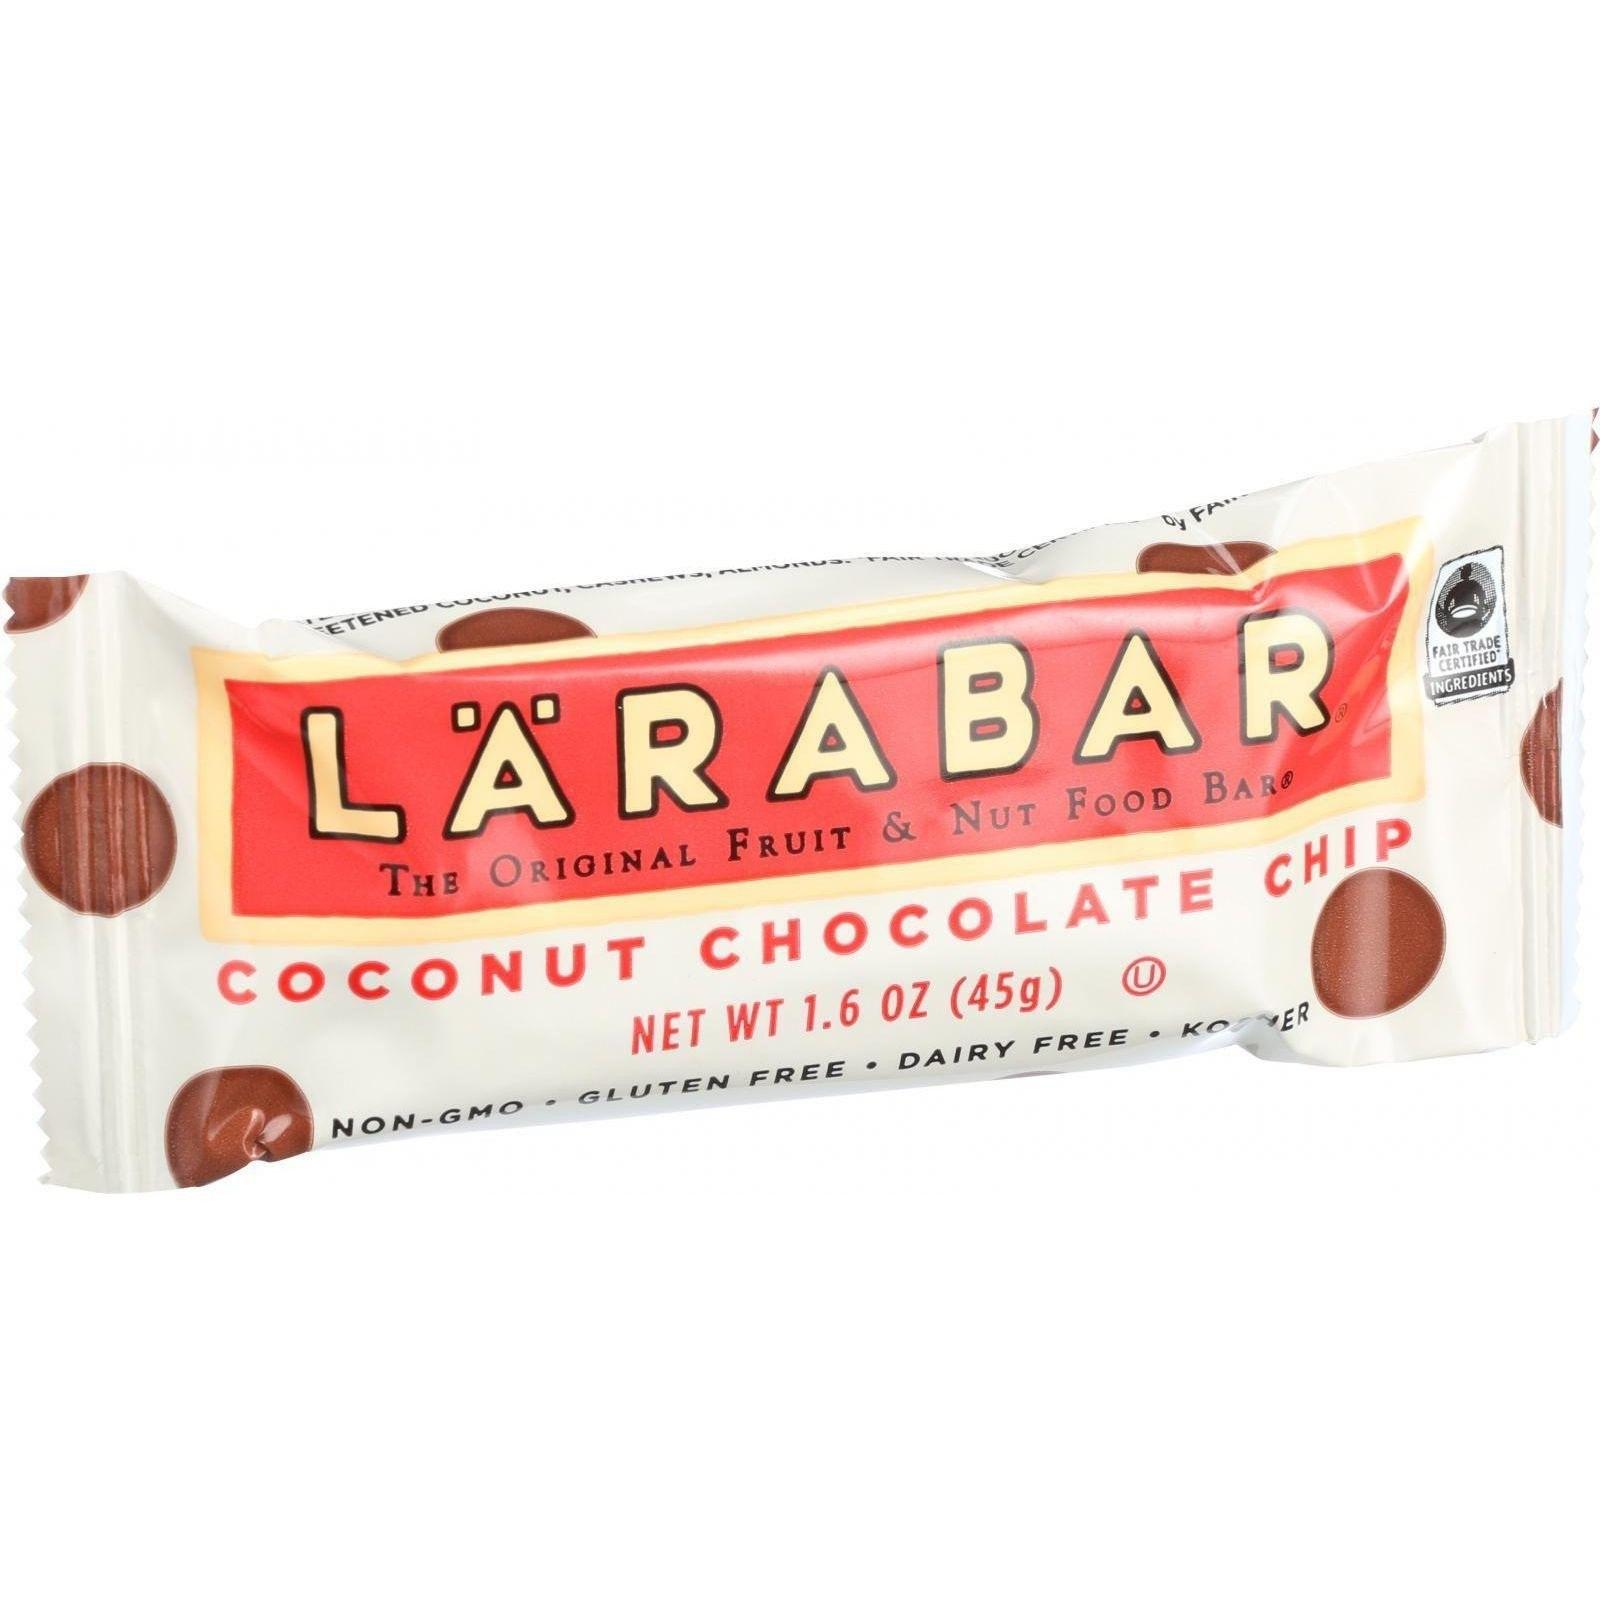 LARABAR® Coconut Chocolate Chip Bars Fruit & Nut